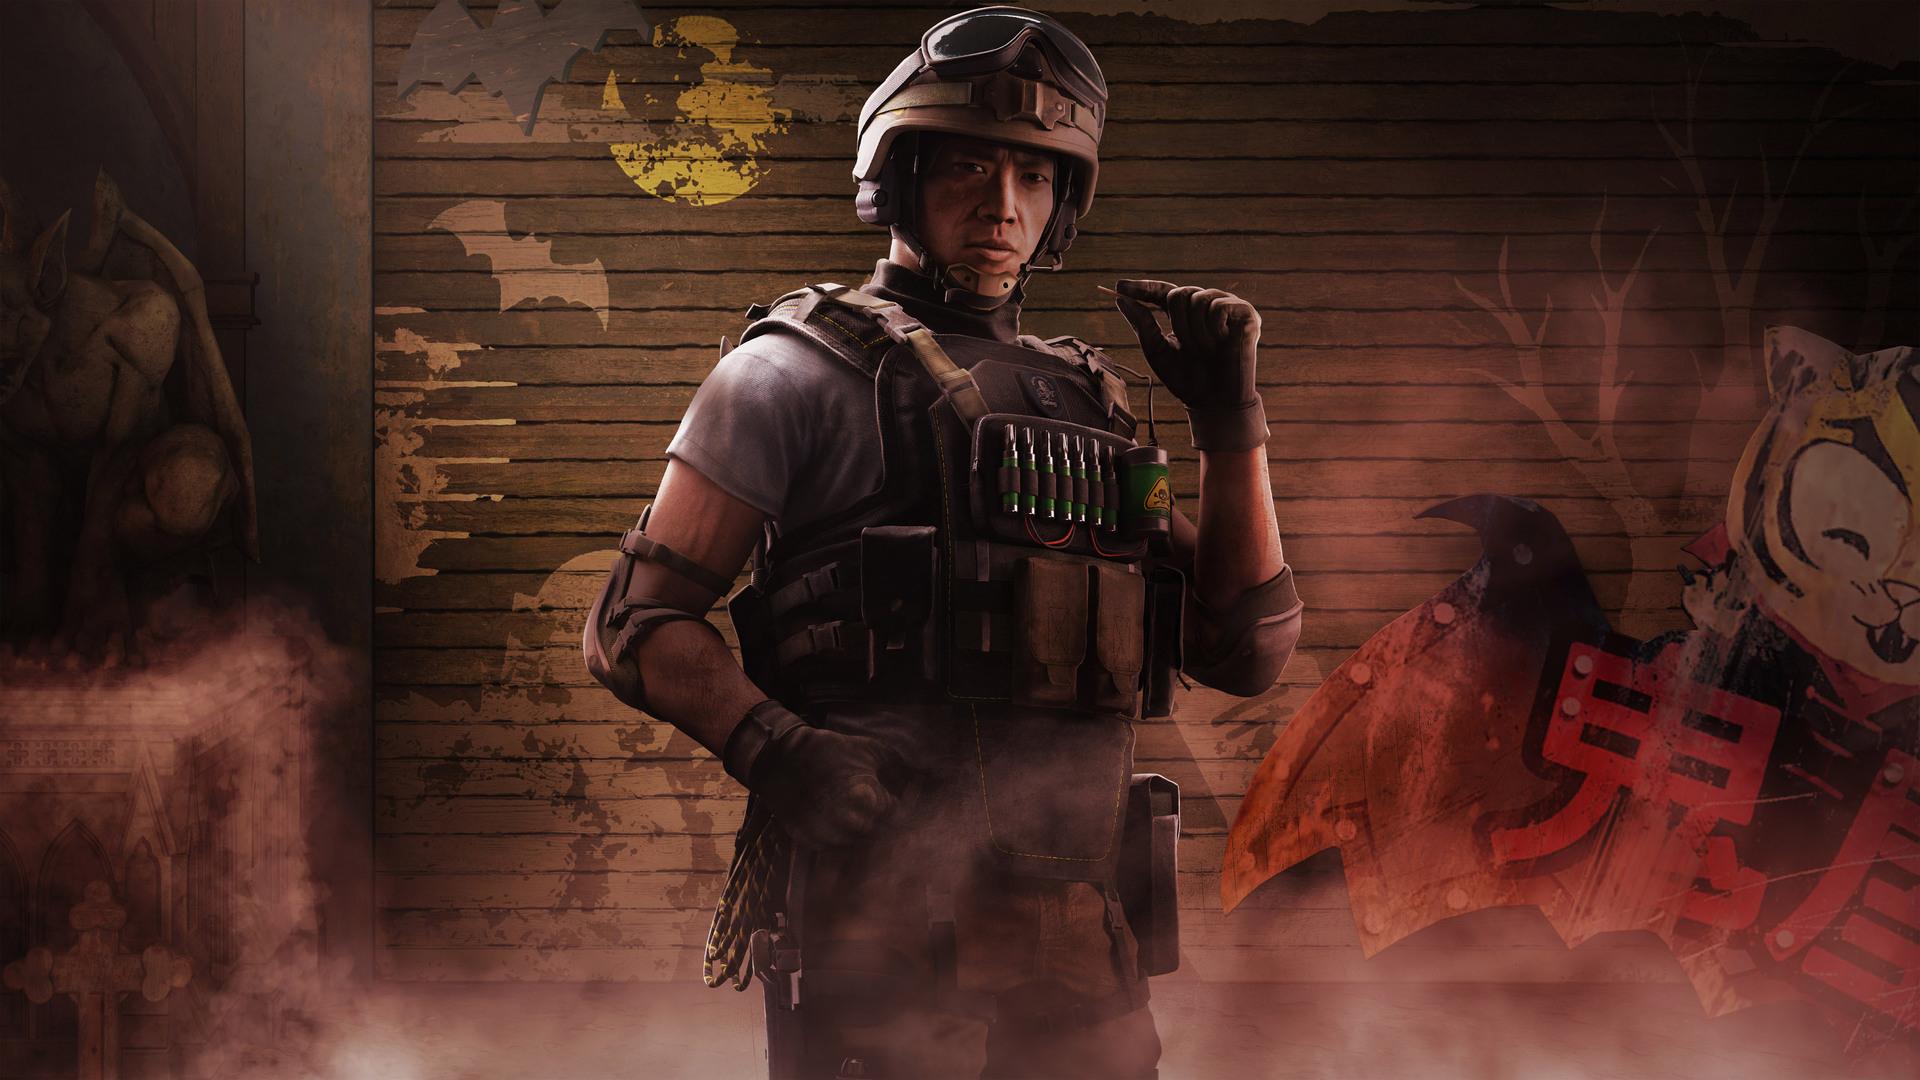 4k Tom Clancys Rainbow Six Siege Game, HD Games, 4k